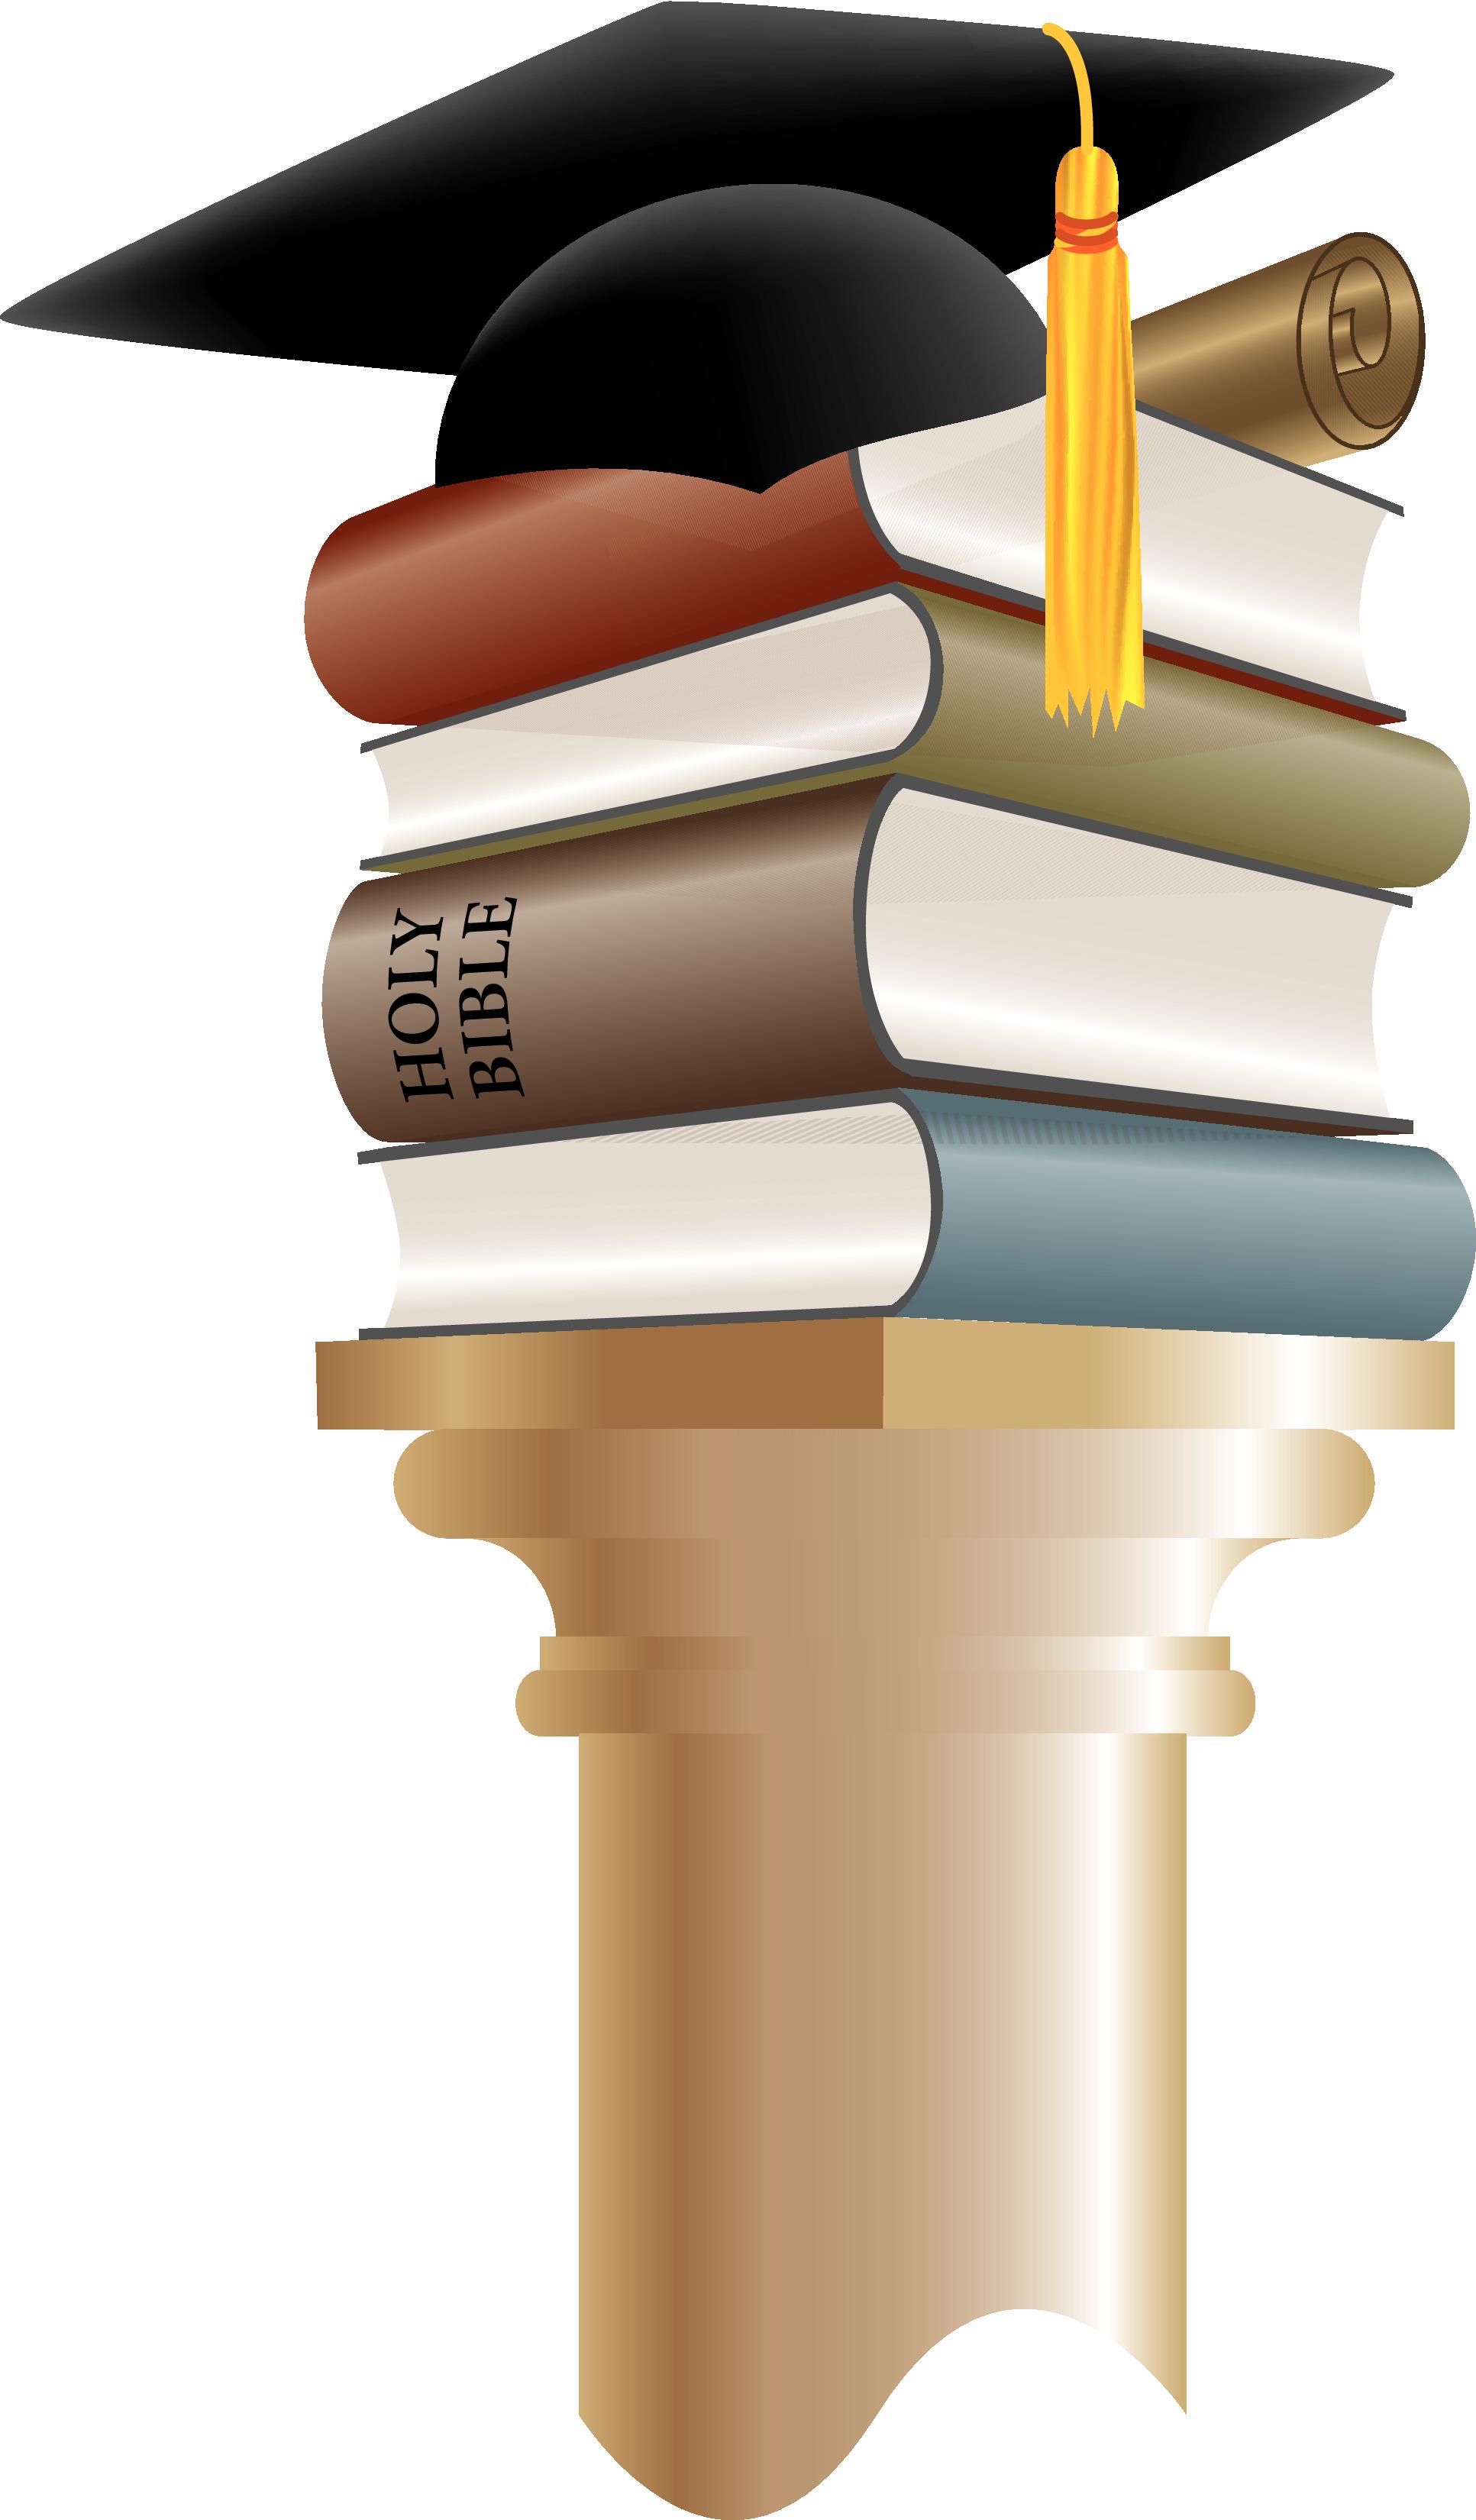 Scholarship comittee christian education. Graduate clipart scolarship